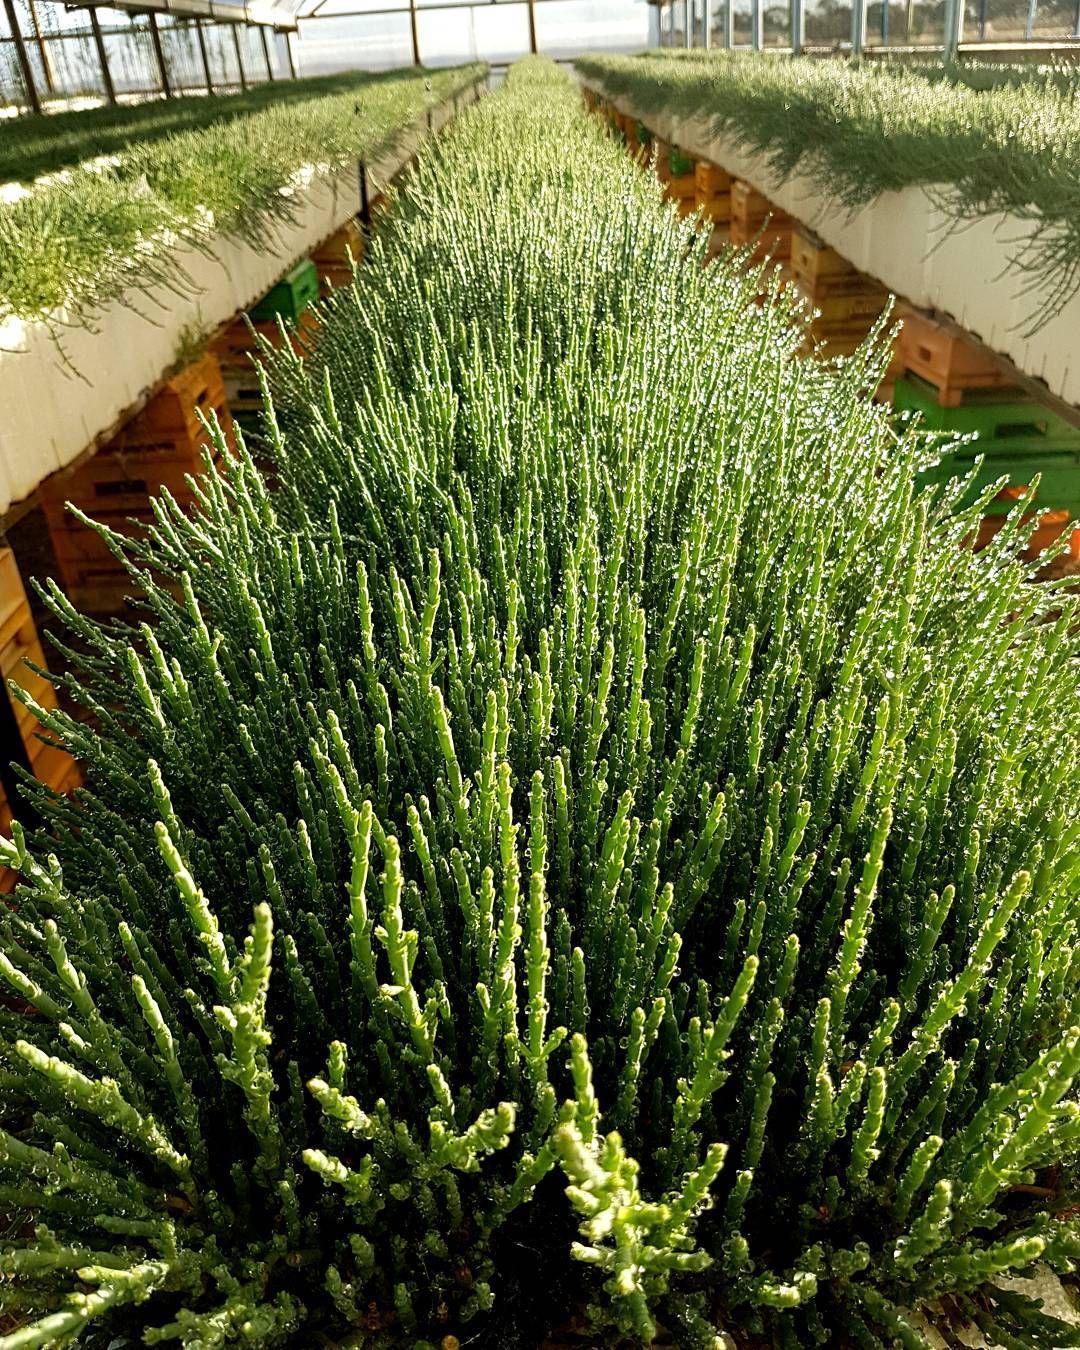 Comment Planter Des Asperges samphire for miles. #sarcocornia quinqueflora